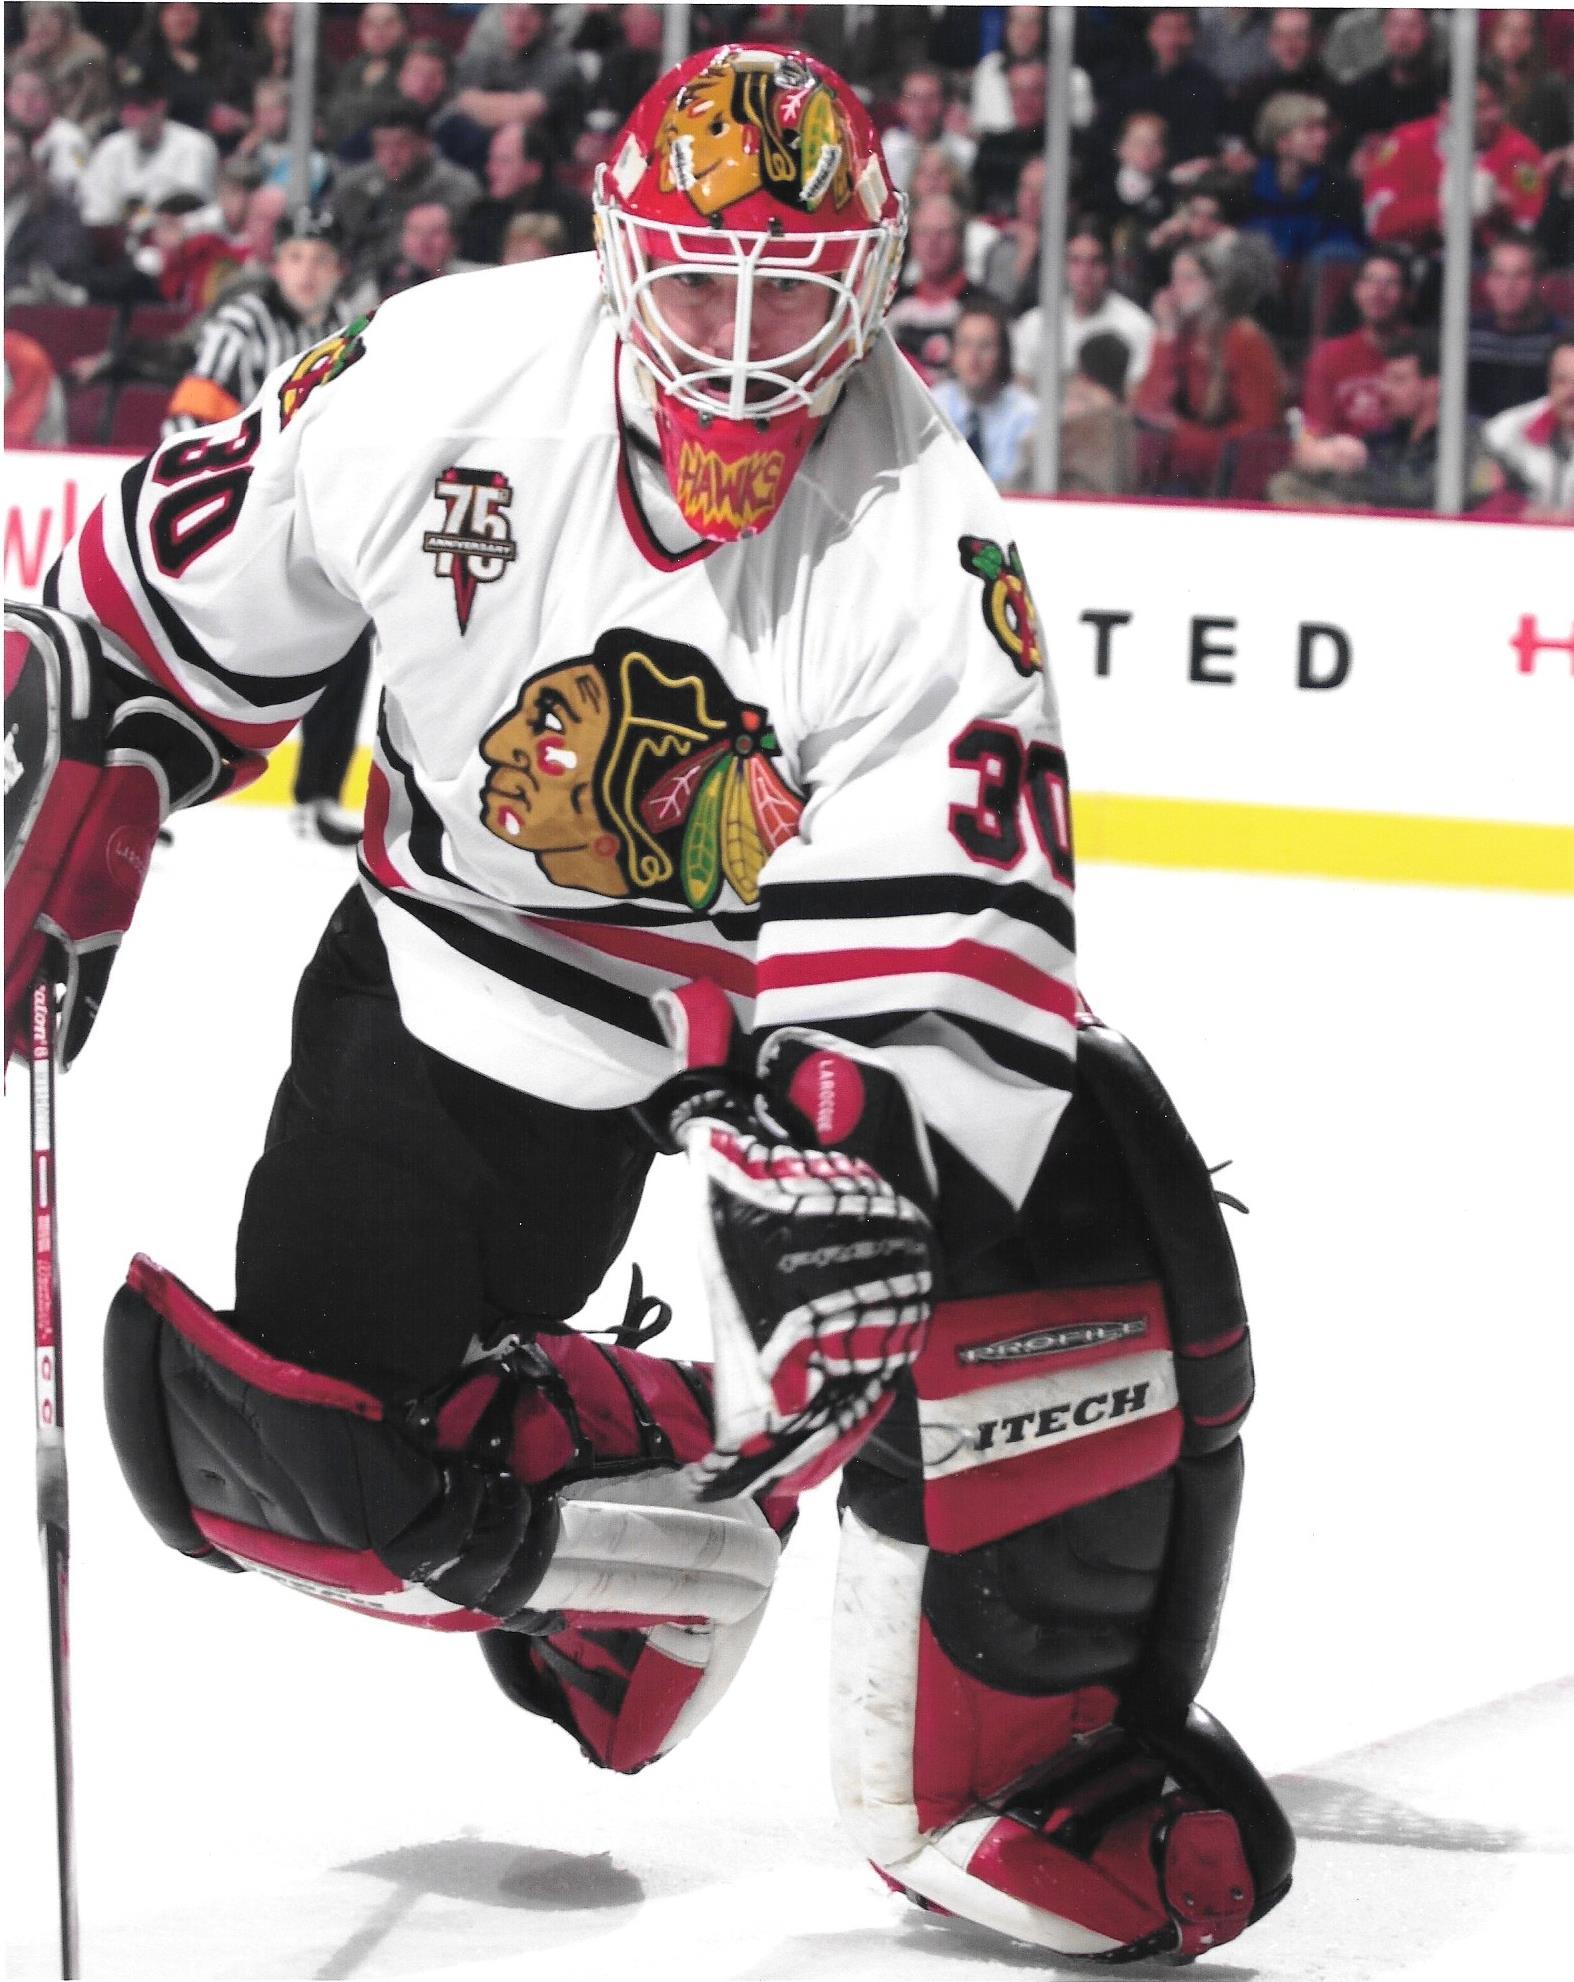 About Michel Ml28 Hockey